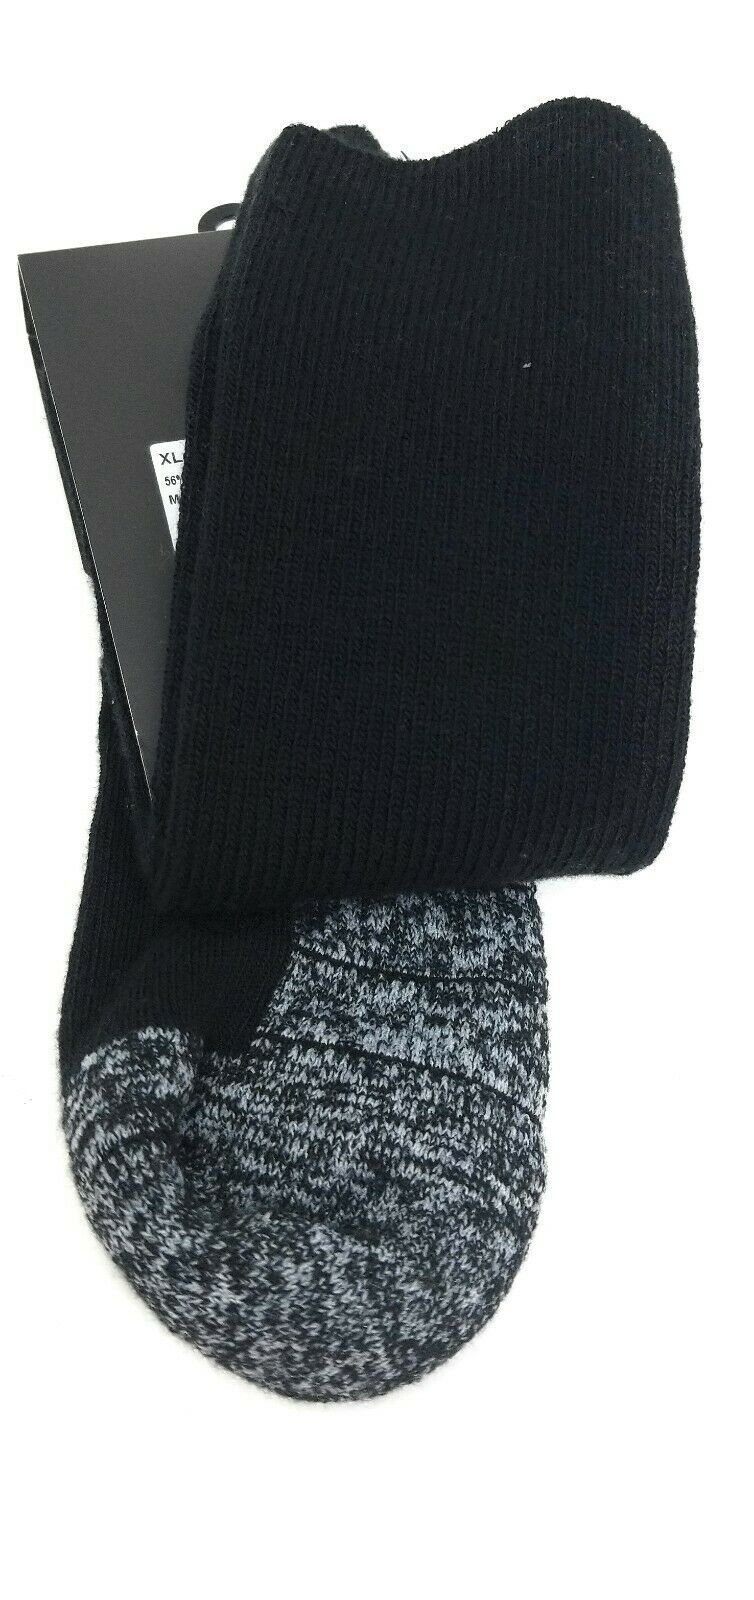 Nike Socks Crew Mens XL 12-15 Black Dri Fit Cushioned Athletic Performance Sport image 4